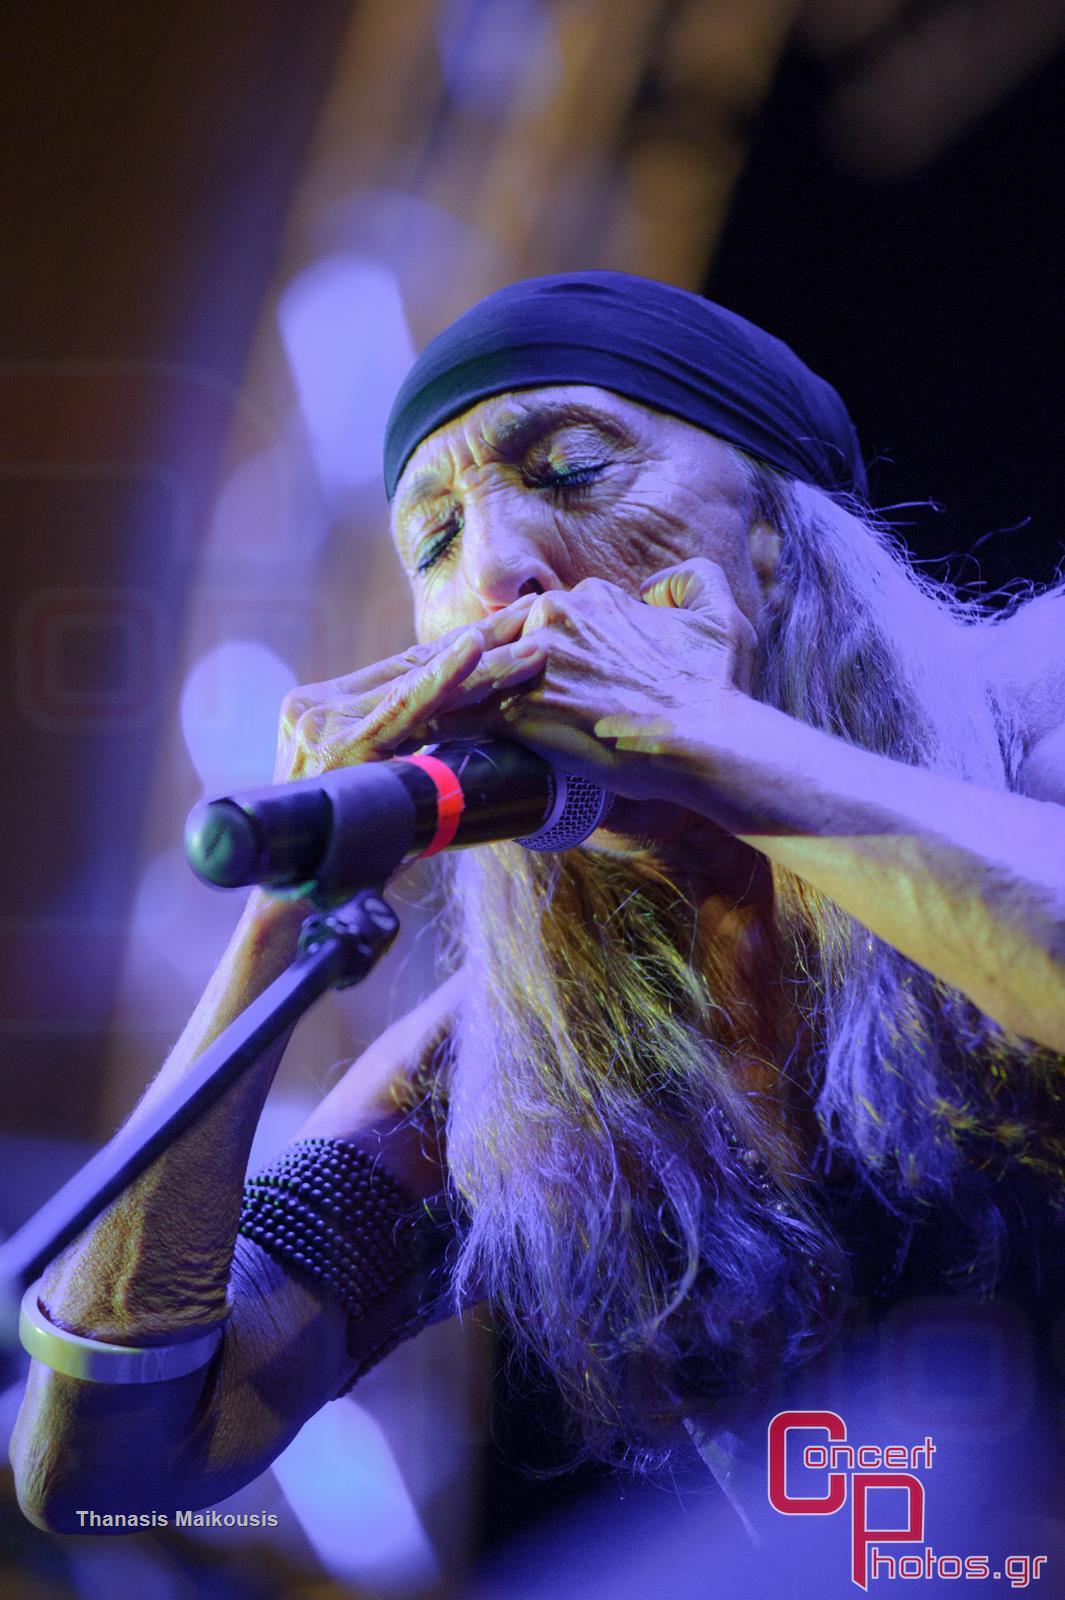 Active Member - Τραγούδα μας να φύγει το σκοτάδι- photographer: Thanasis Maikousis - concertphotos_-5920